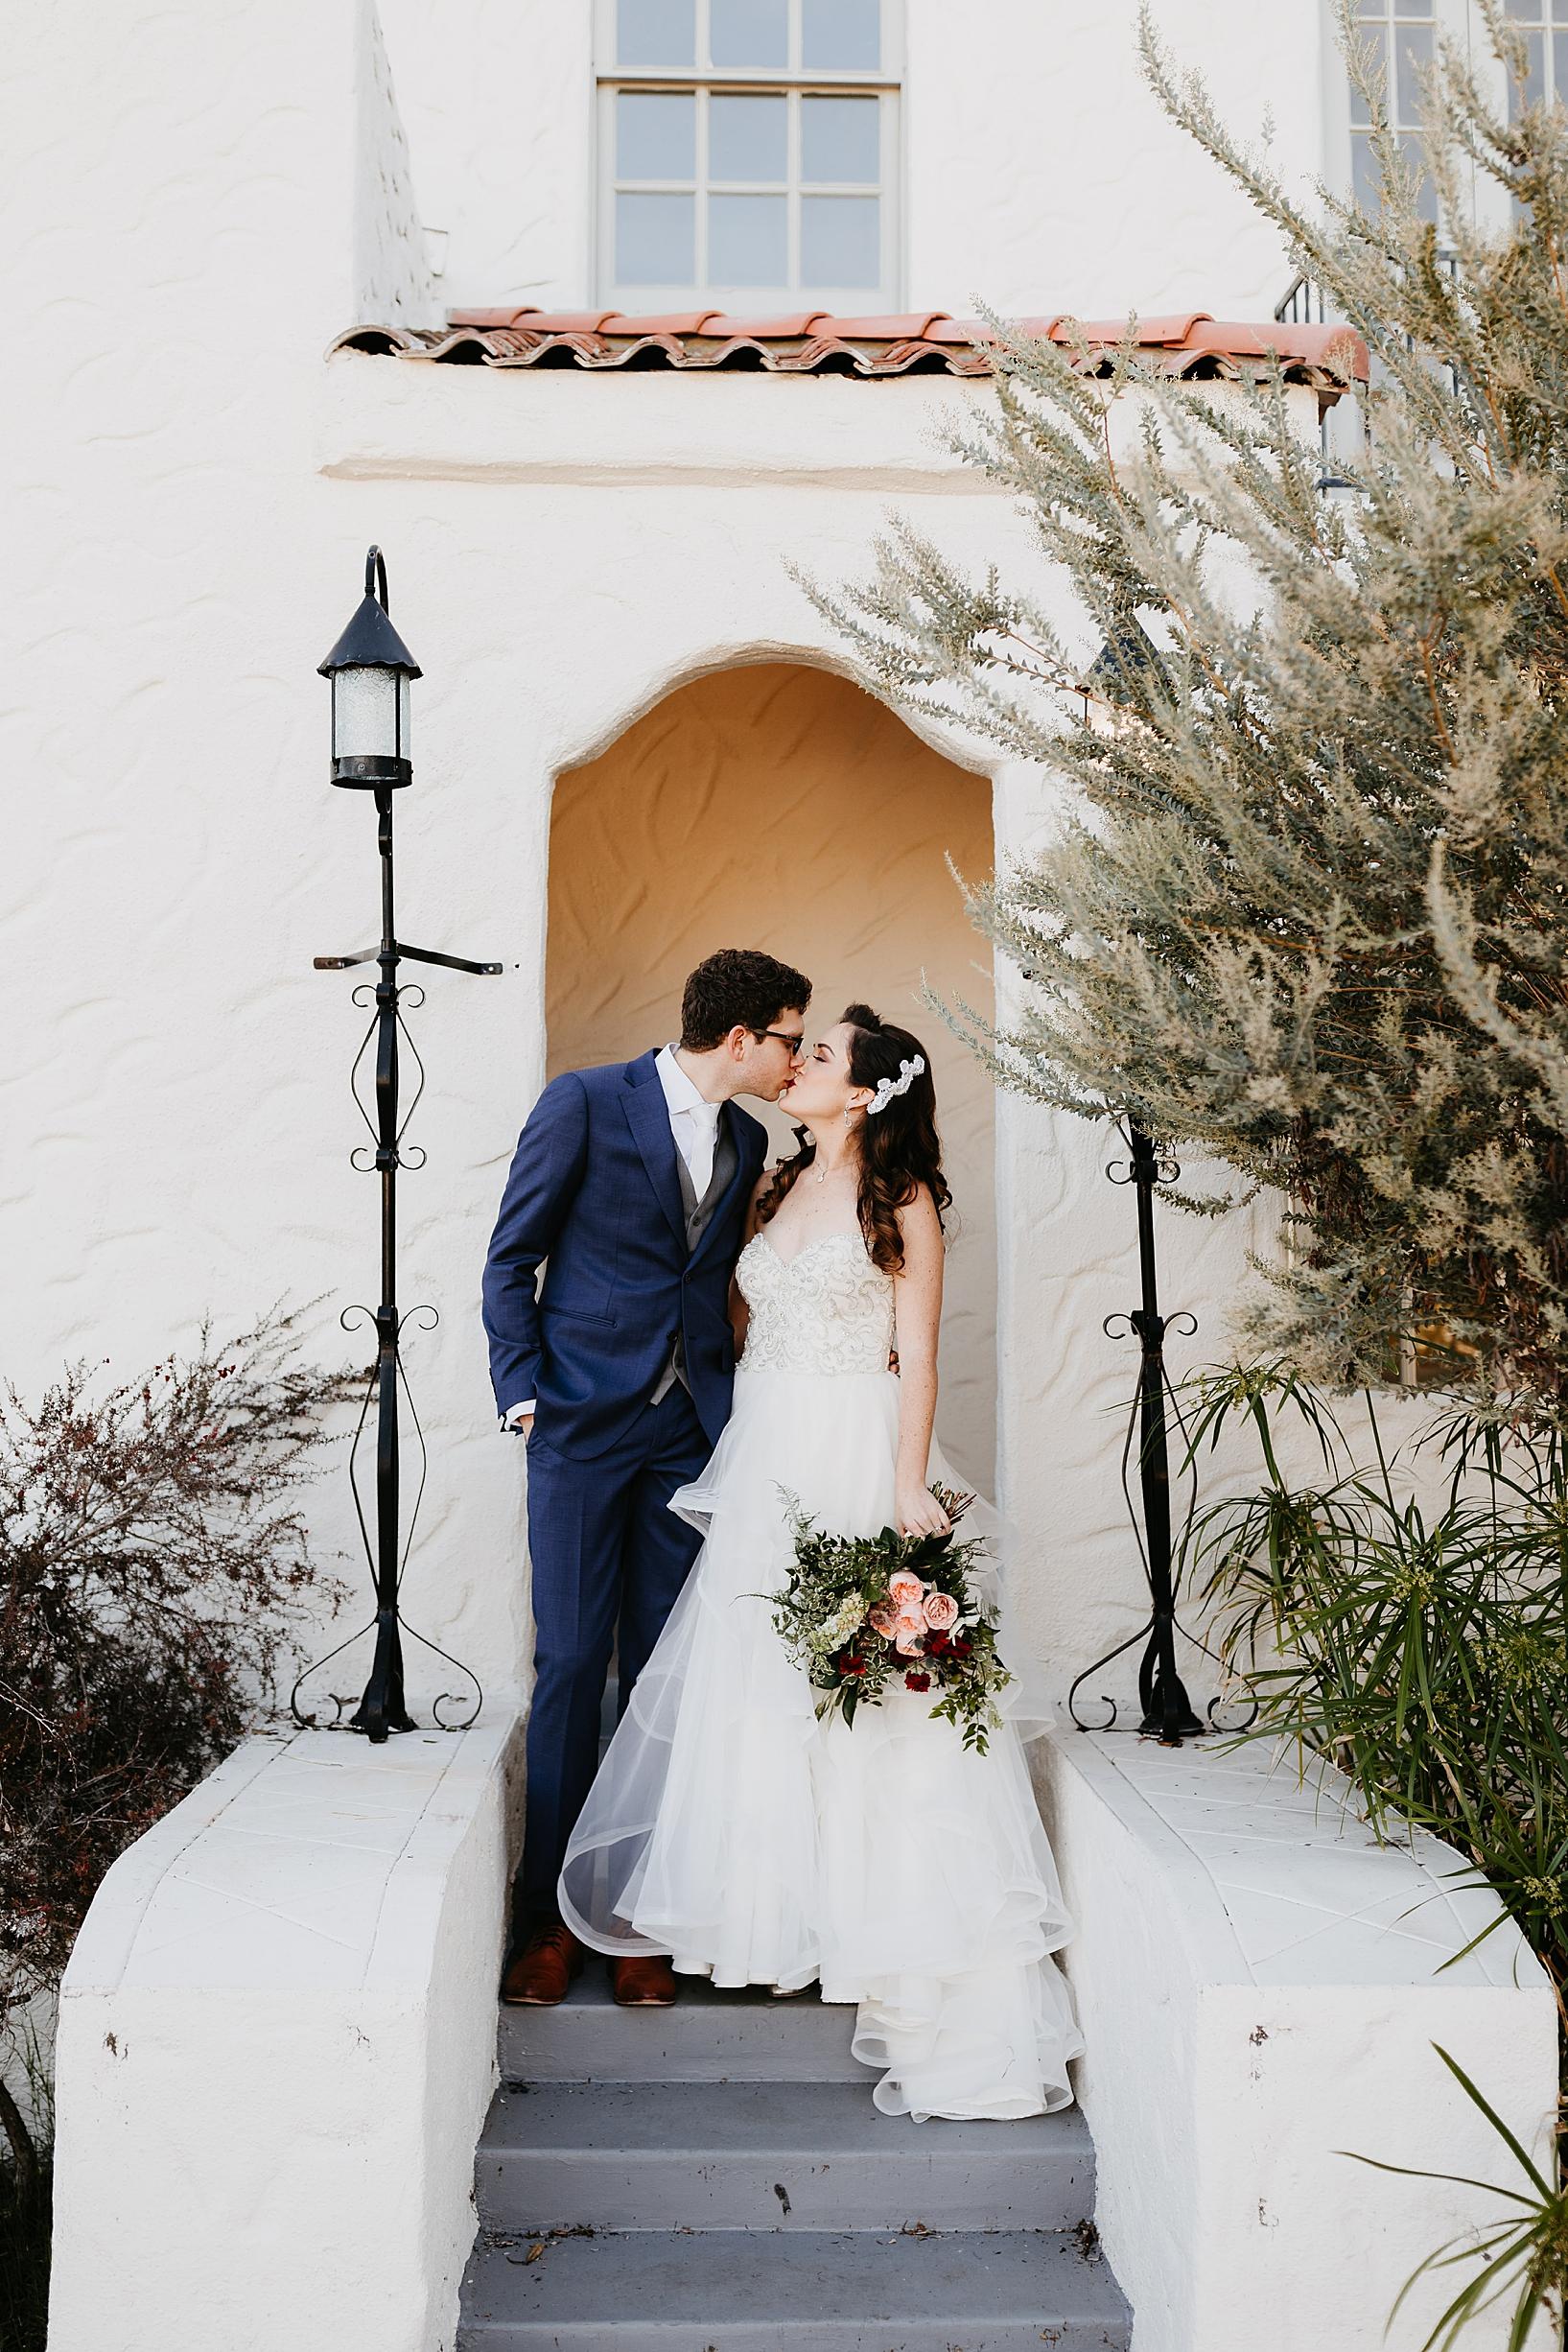 Brick-San-Diego-Winter-Wedding-23.jpg